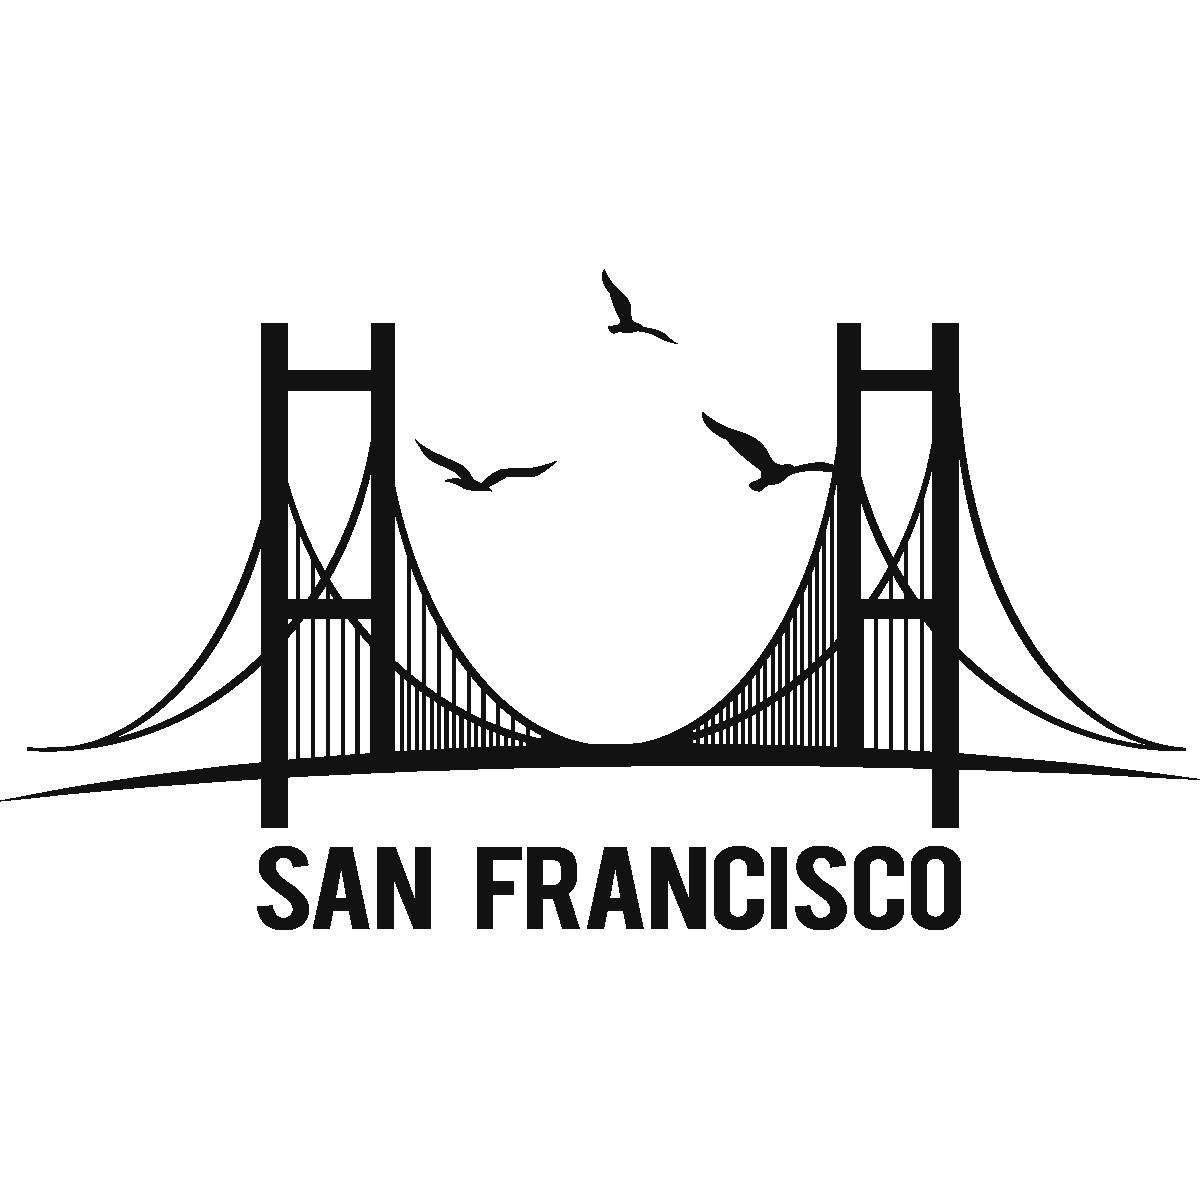 Dessin Du Pont De San Francisco stickers muraux pays et villes - sticker pont de san francisco